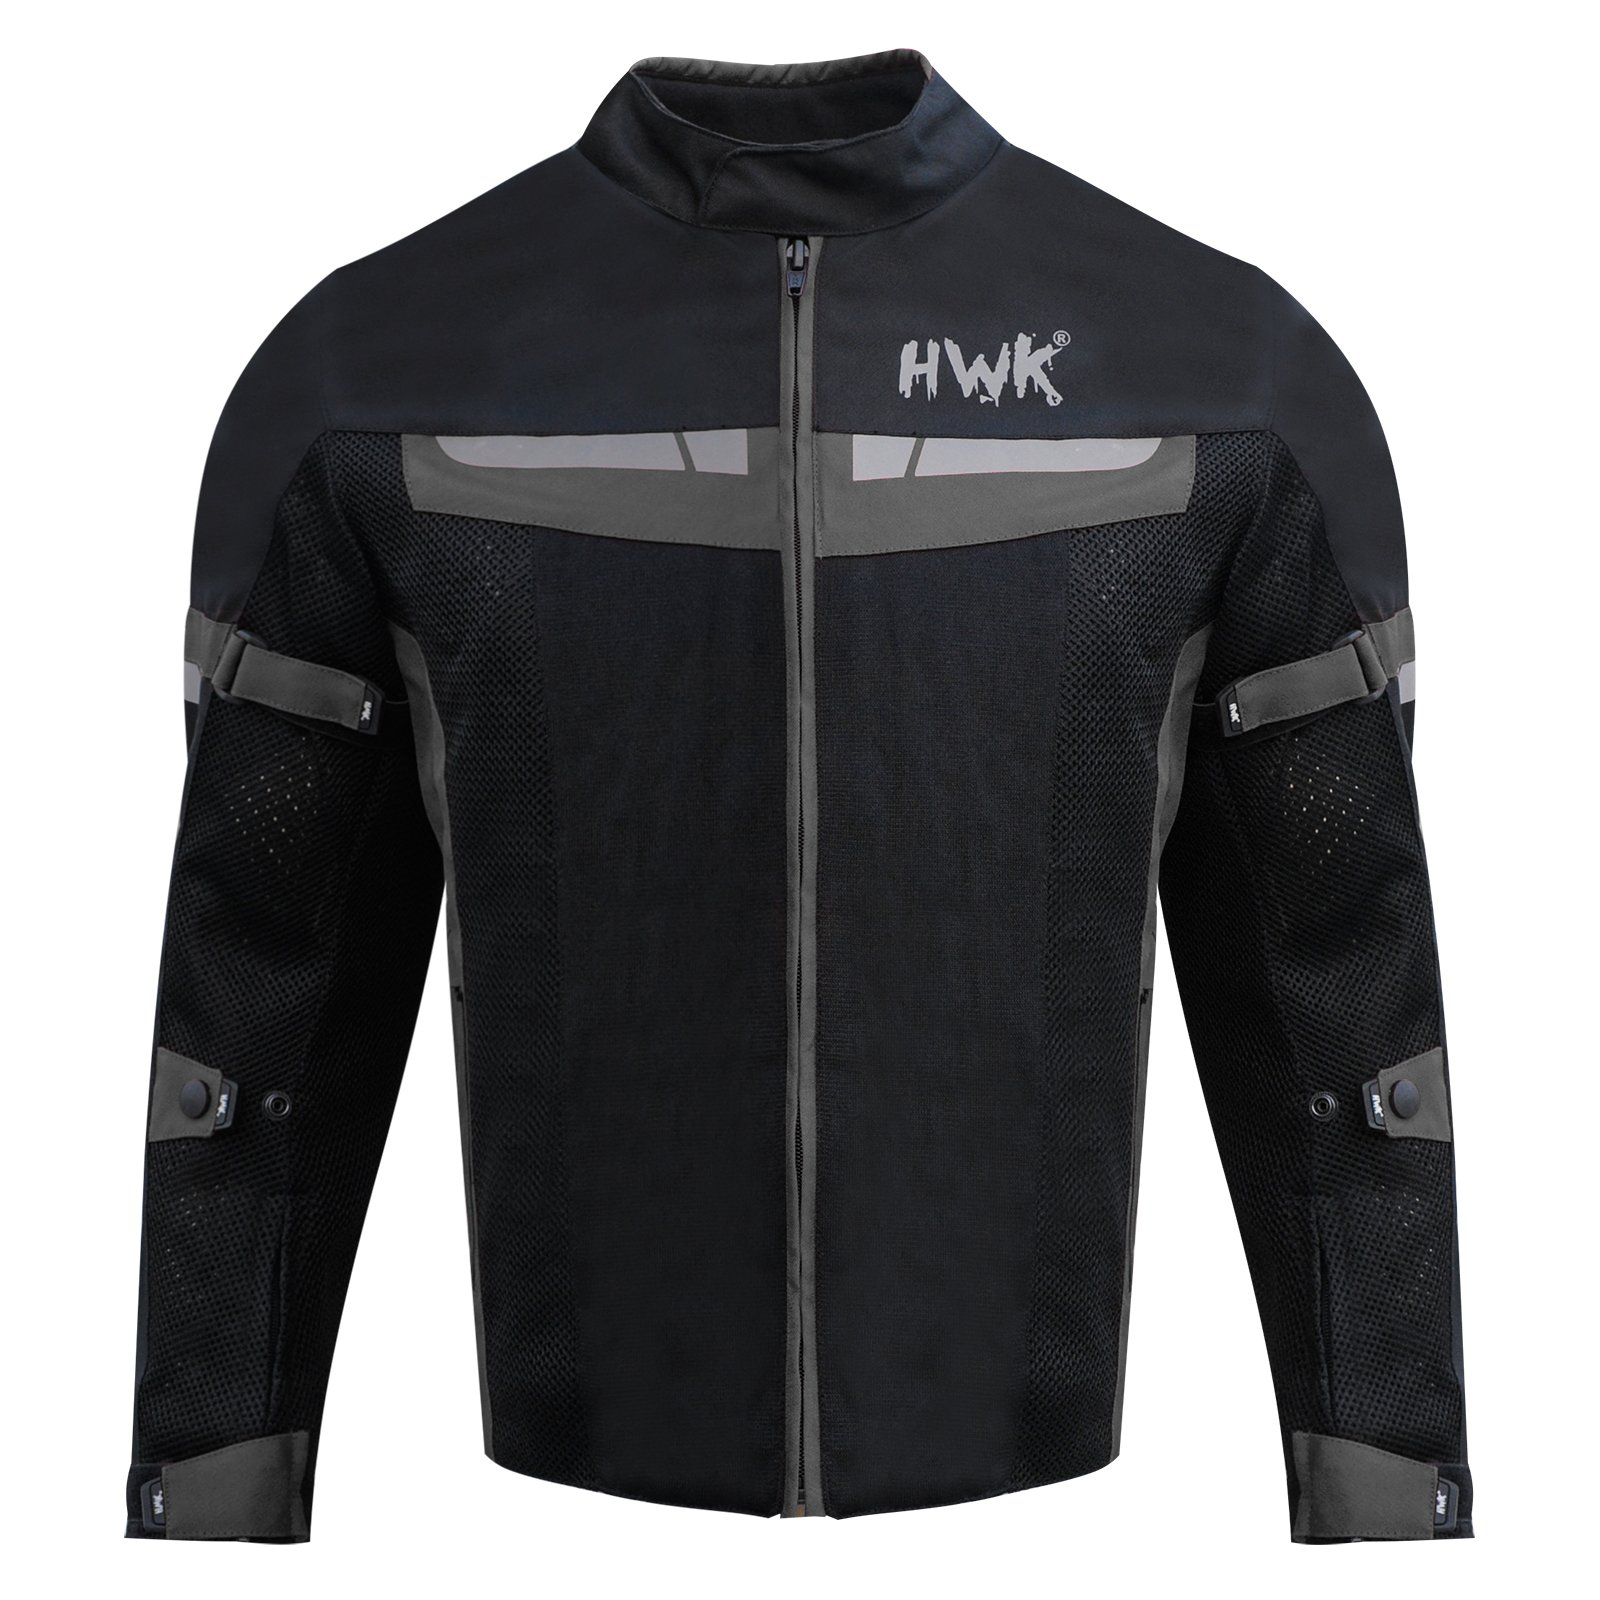 HWK Mesh Motorcycle Jacket Riding Air Motorbike Jacket Biker CE Armored Breathable (Small, Black)